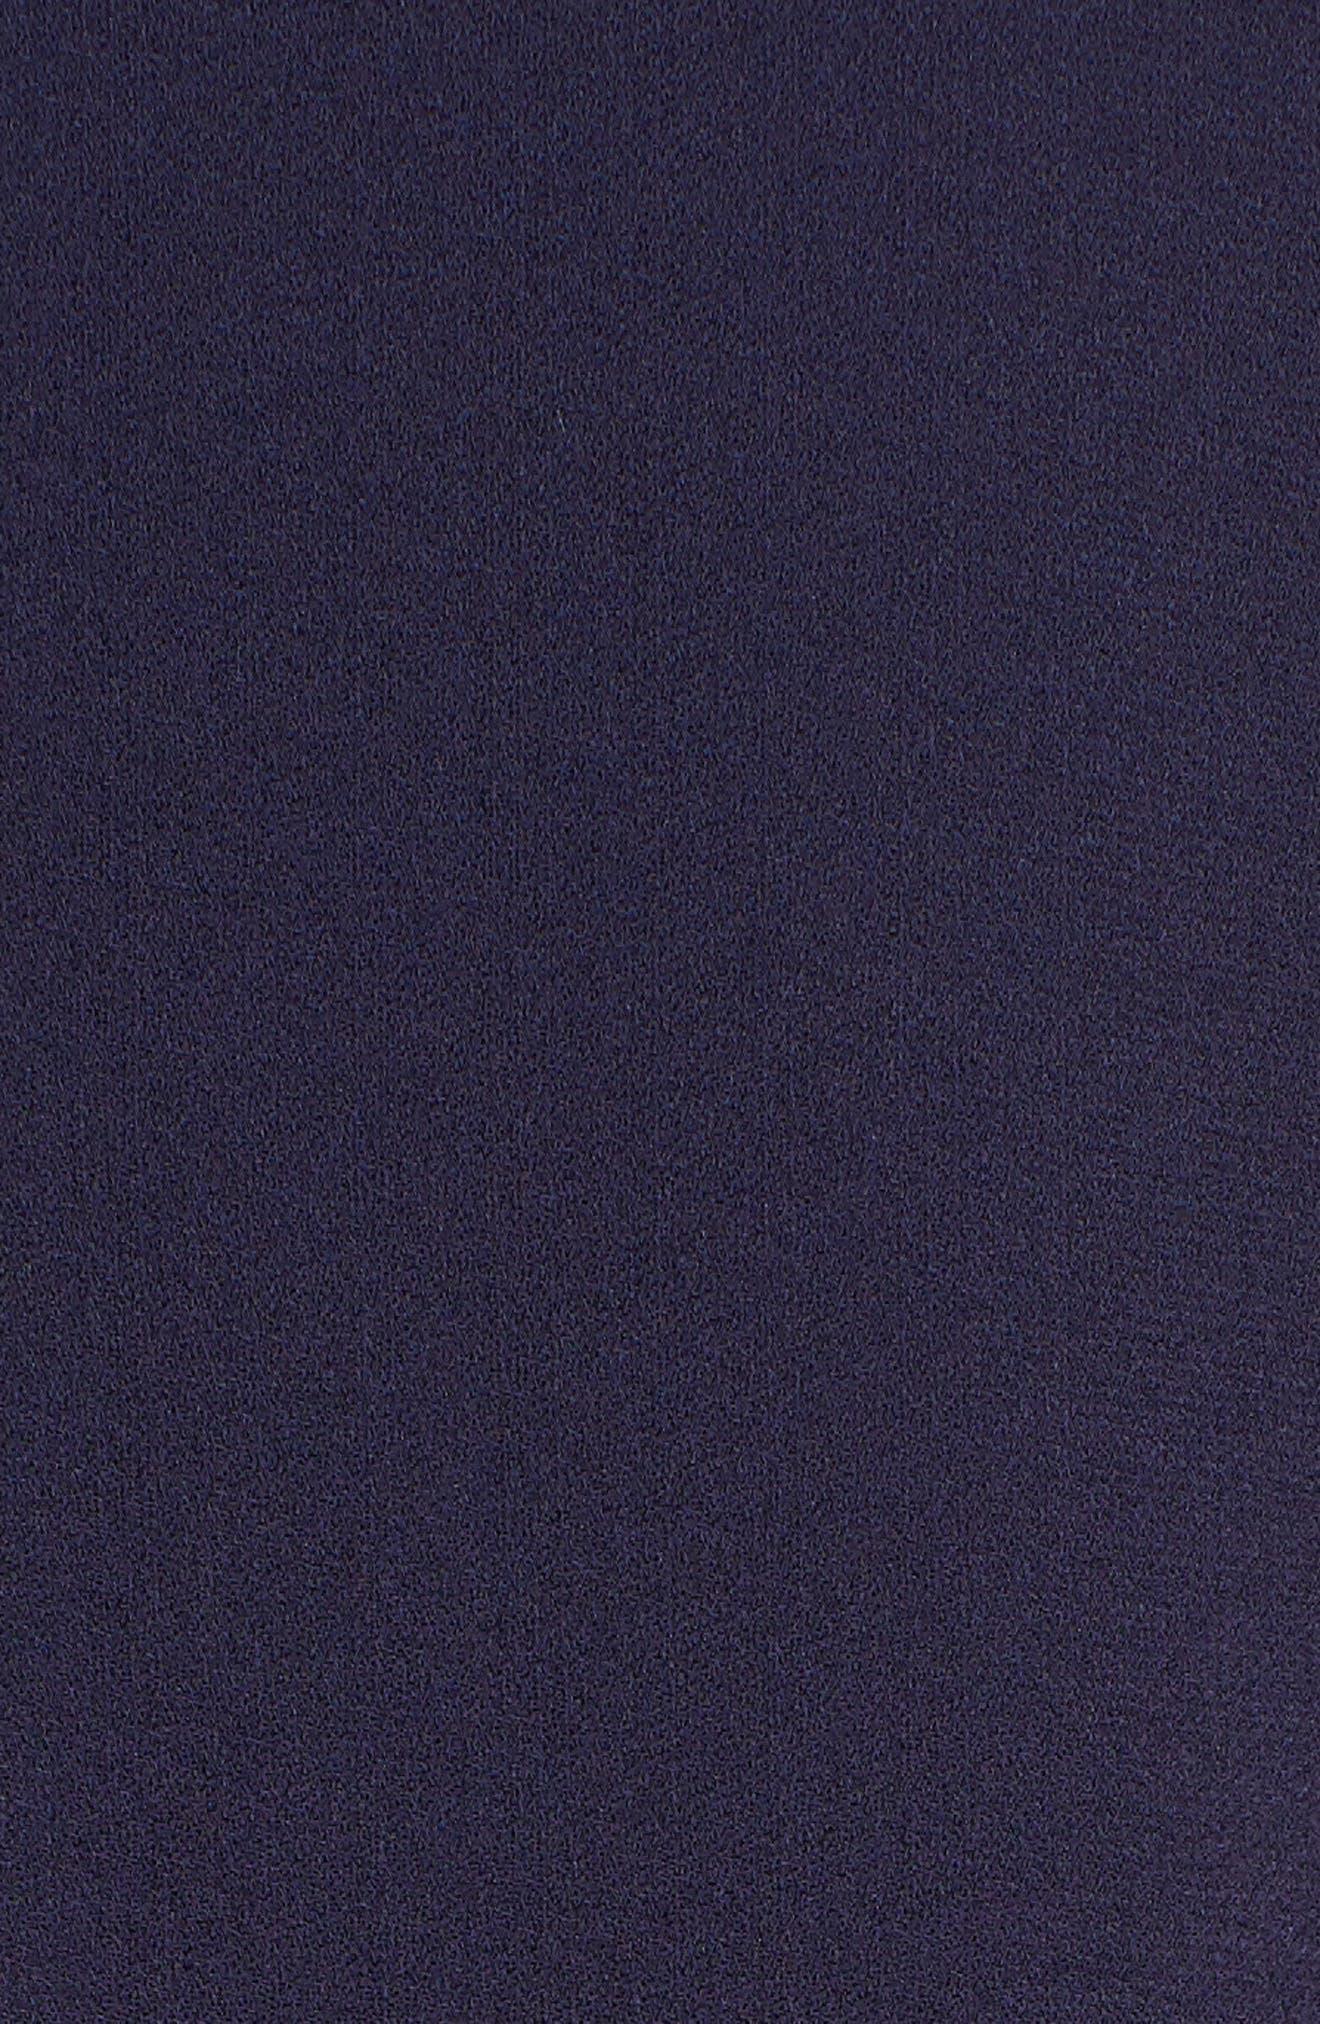 Piped Silk Blouse,                             Alternate thumbnail 6, color,                             Salt Lake